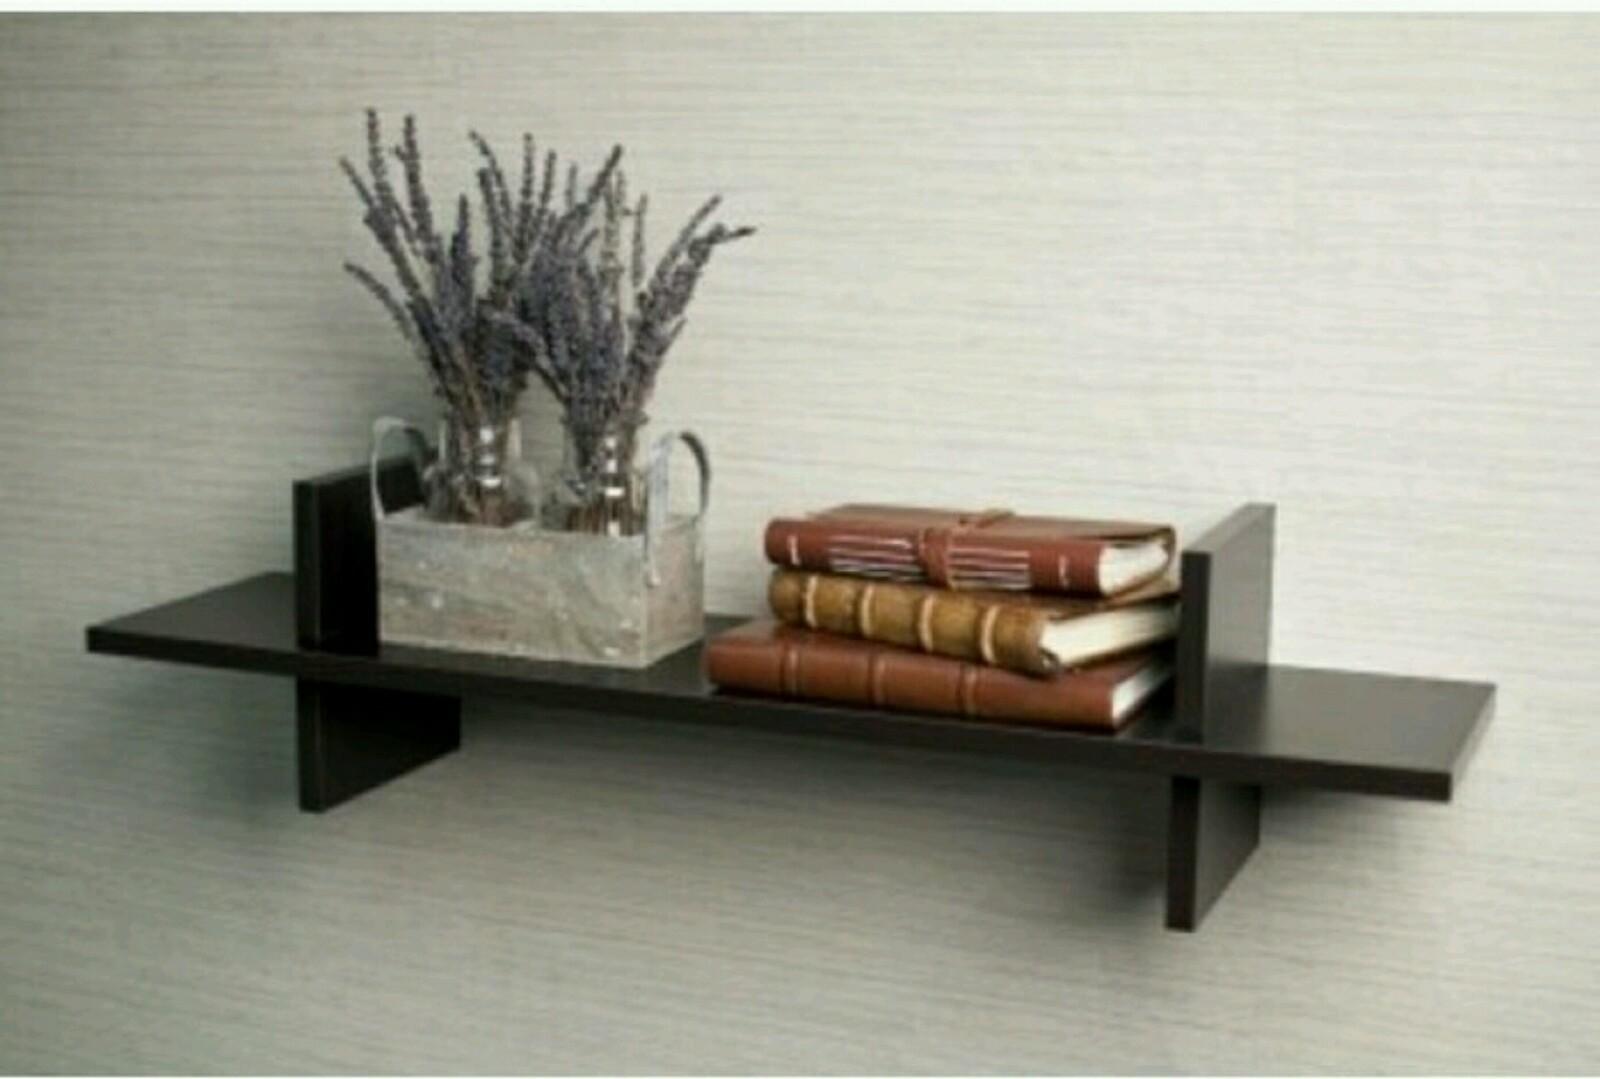 View huzain hadicrafts Wooden Wall Shelf(Number of Shelves - 1) Furniture (huzain hadicrafts)